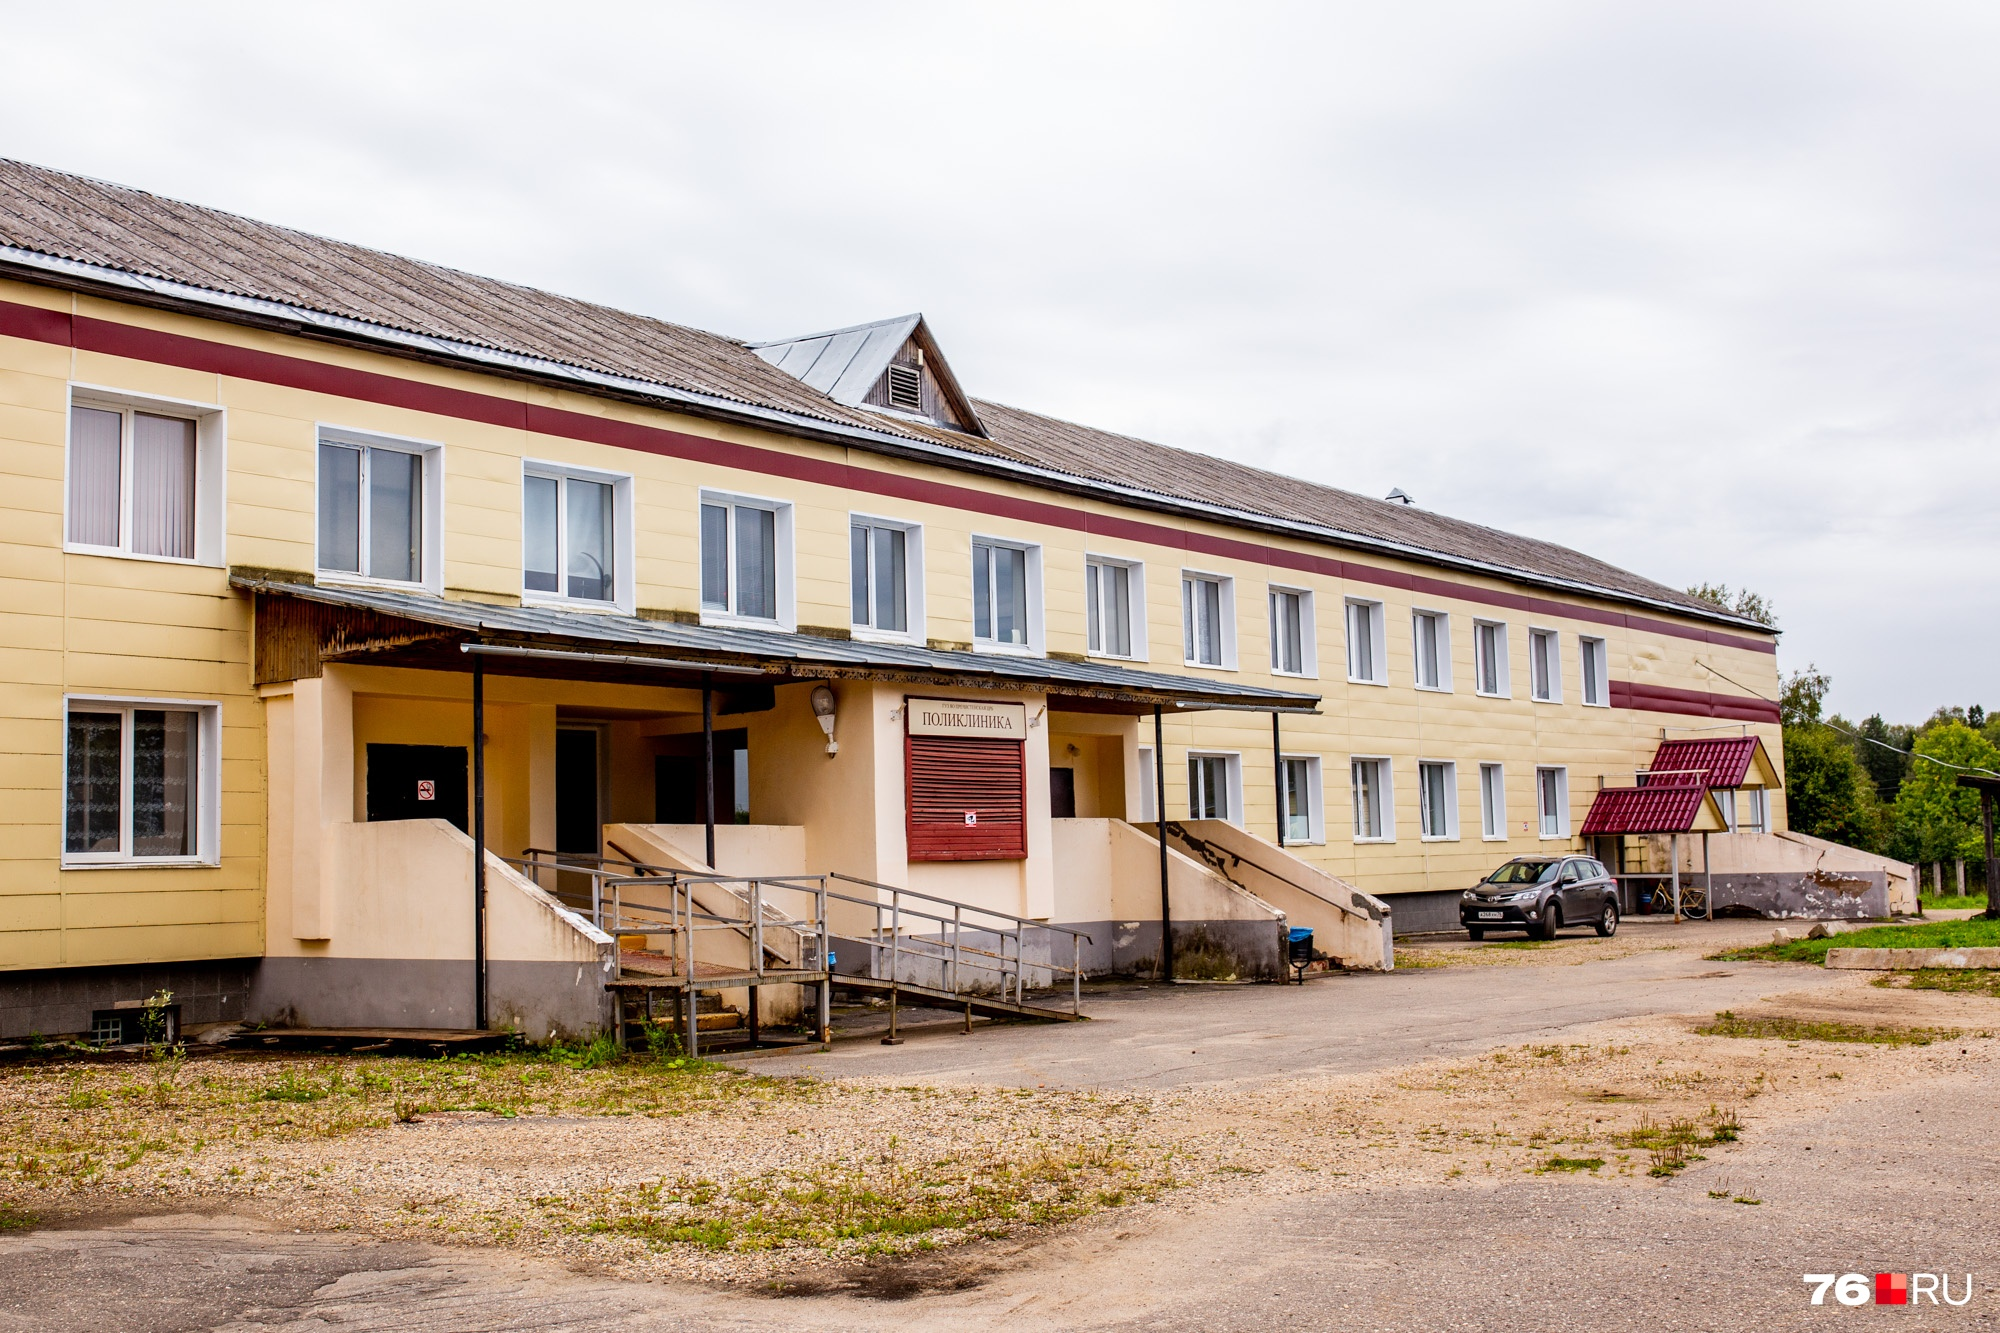 Пречистенская центральная больница